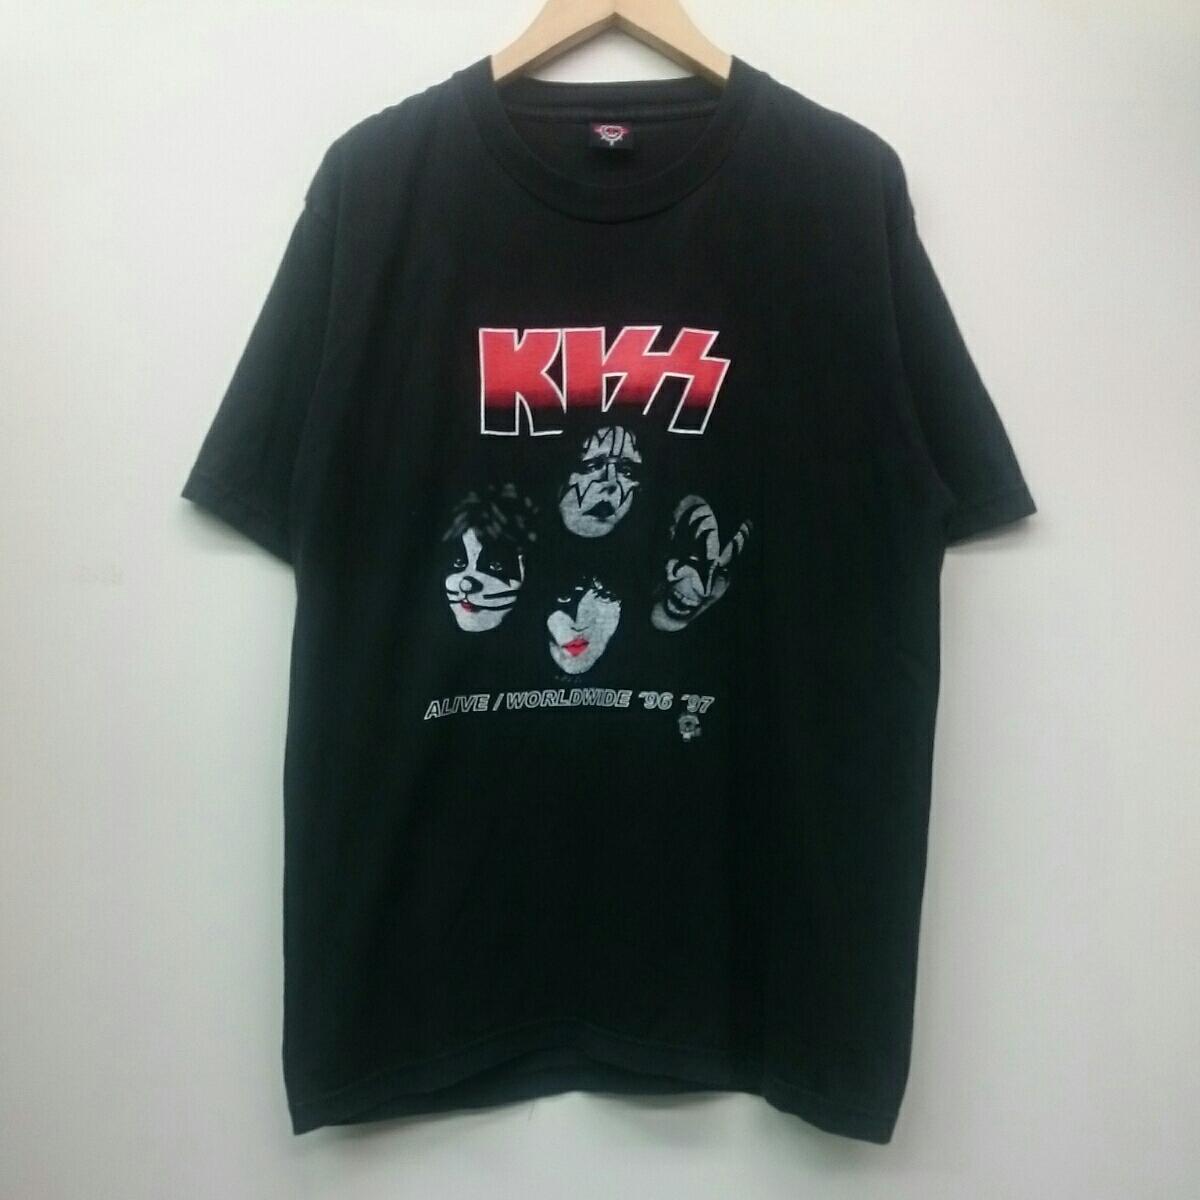 KISS キッス ALIVE/WORLD WIDE 96-97 THE GTS Tシャツ アメリカ ロックバンド ライブグッズの画像